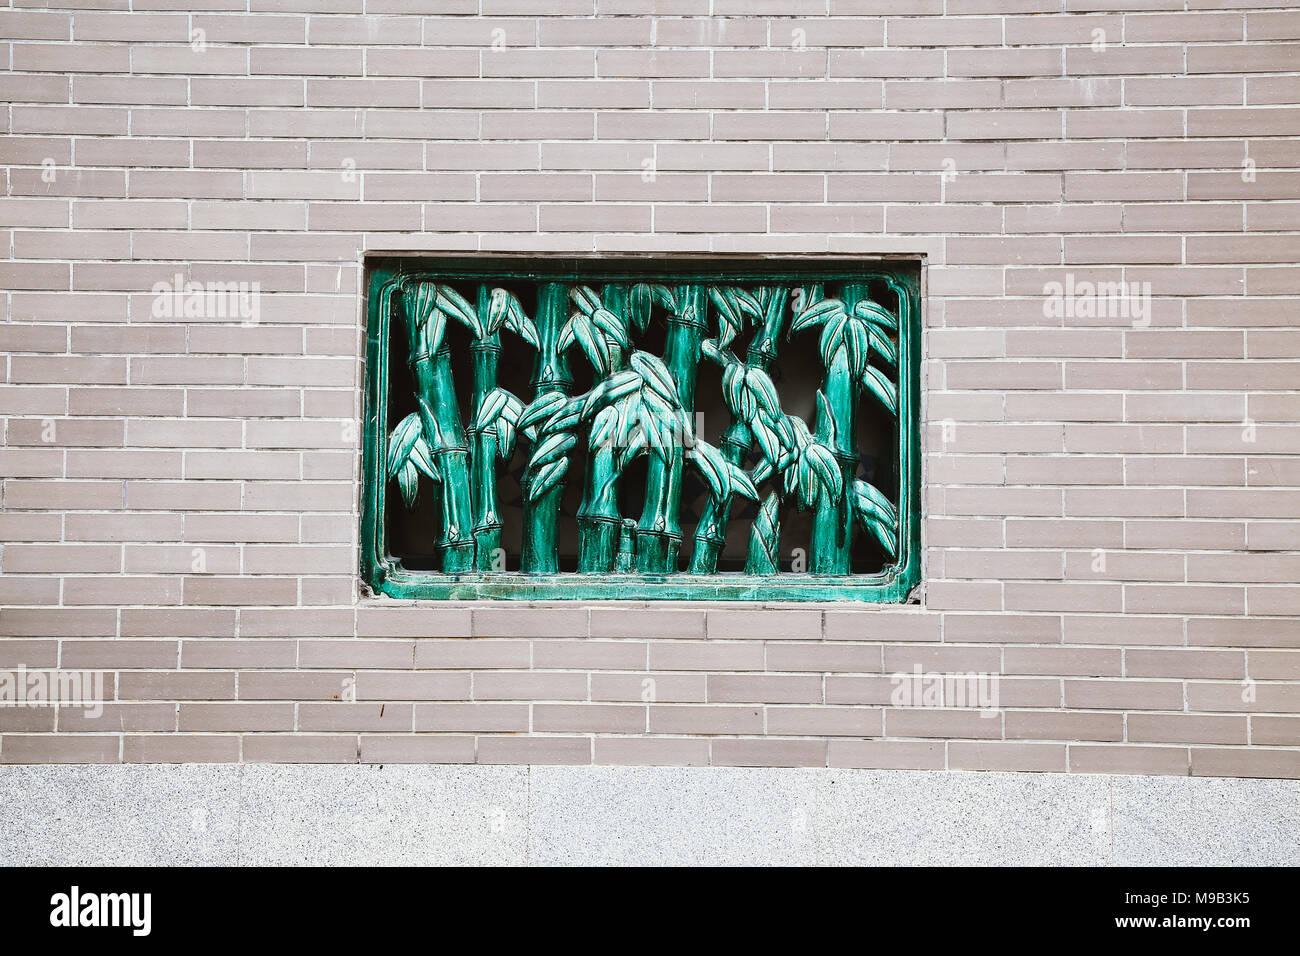 Chinese brick wall and bamboo style window - Stock Image